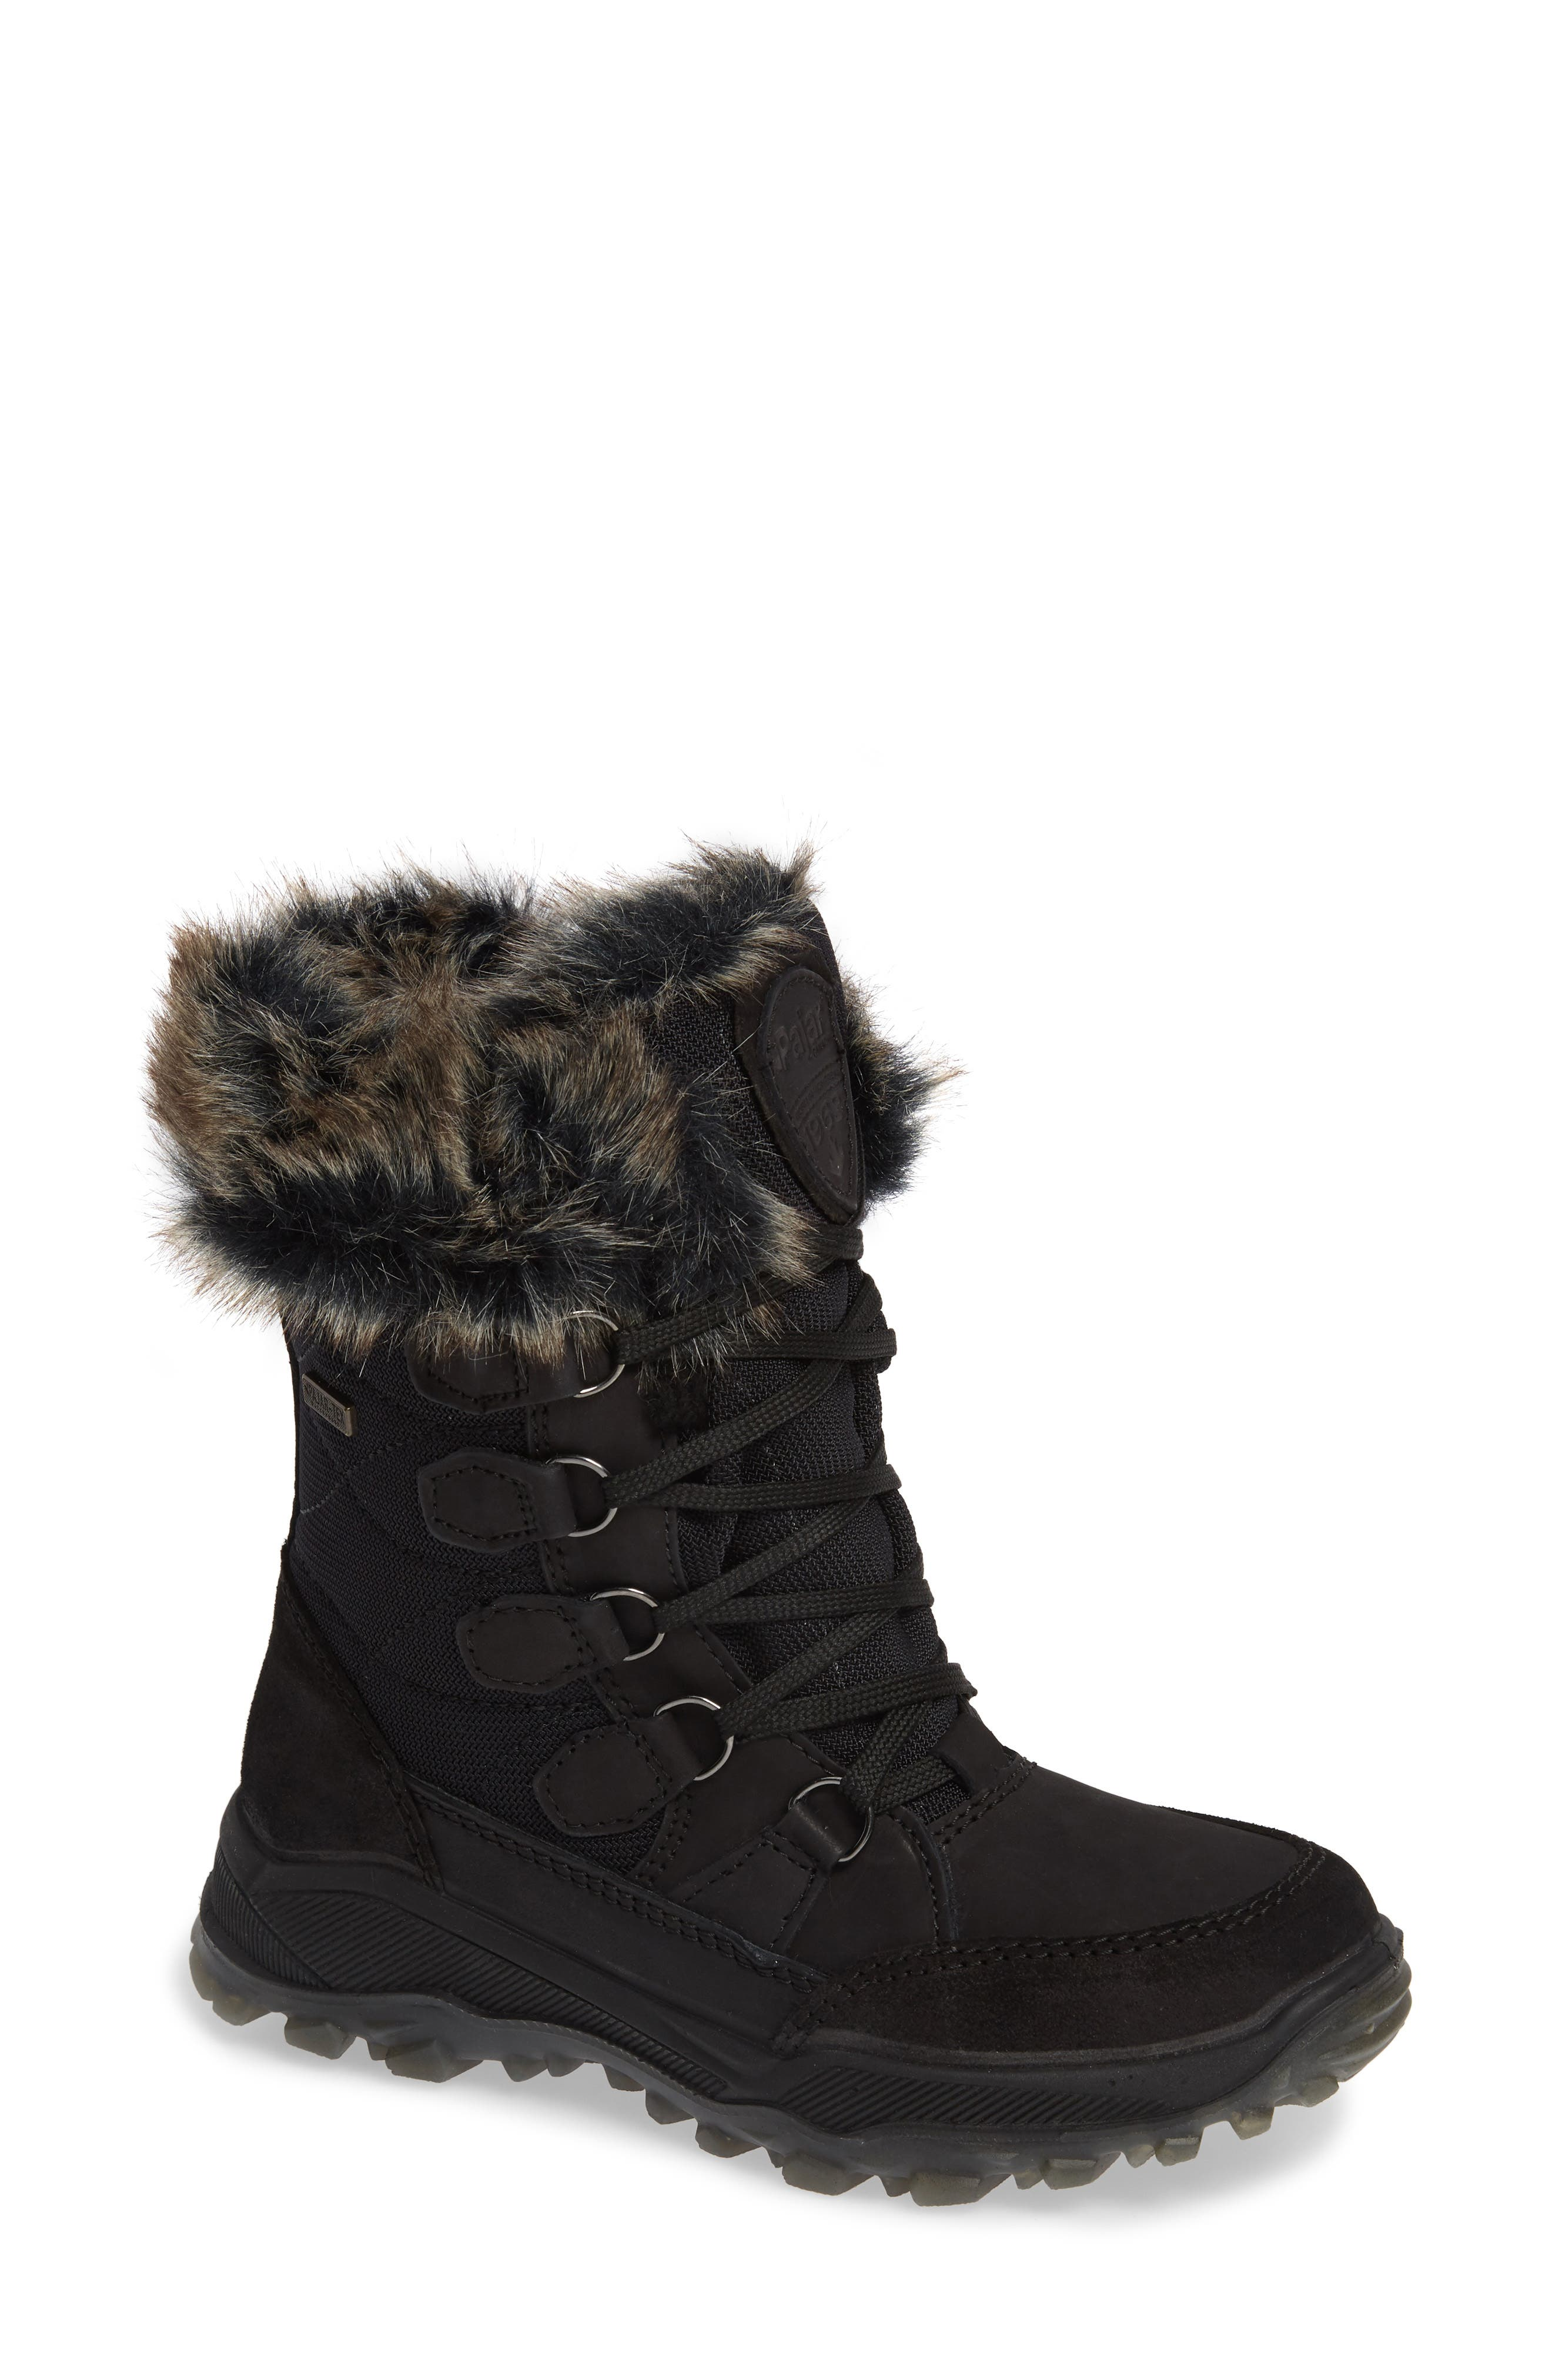 PAJAR Kelsey Waterproof Rain Boot With Faux Fur Lining in Nero/ Nero